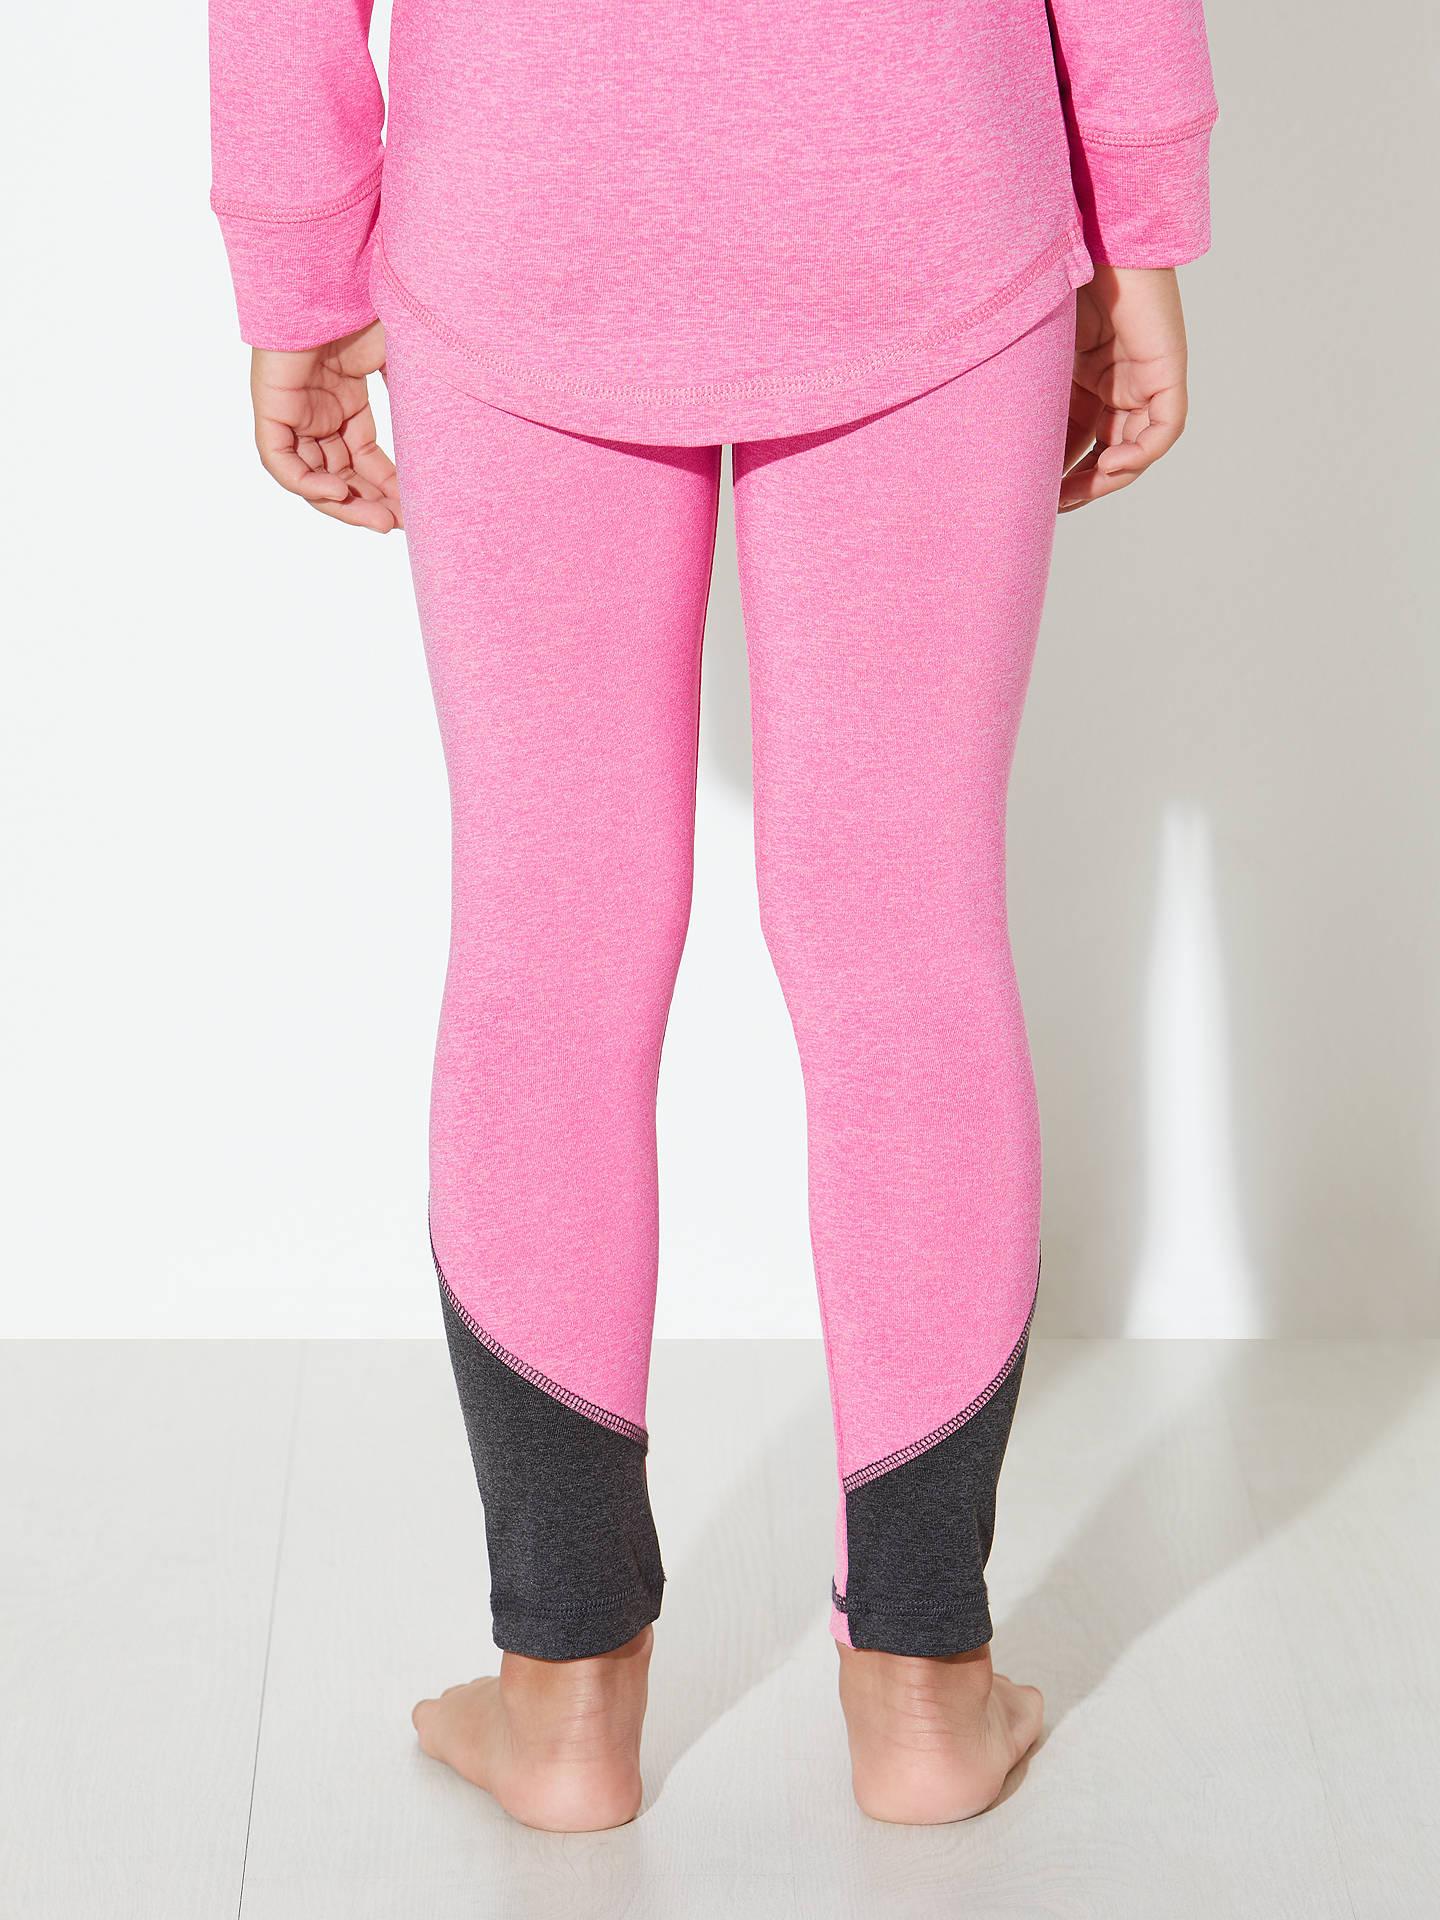 5d44d1104f8 Buy John Lewis Girls' Sports Leggings, Pink, 2 years Online at johnlewis.